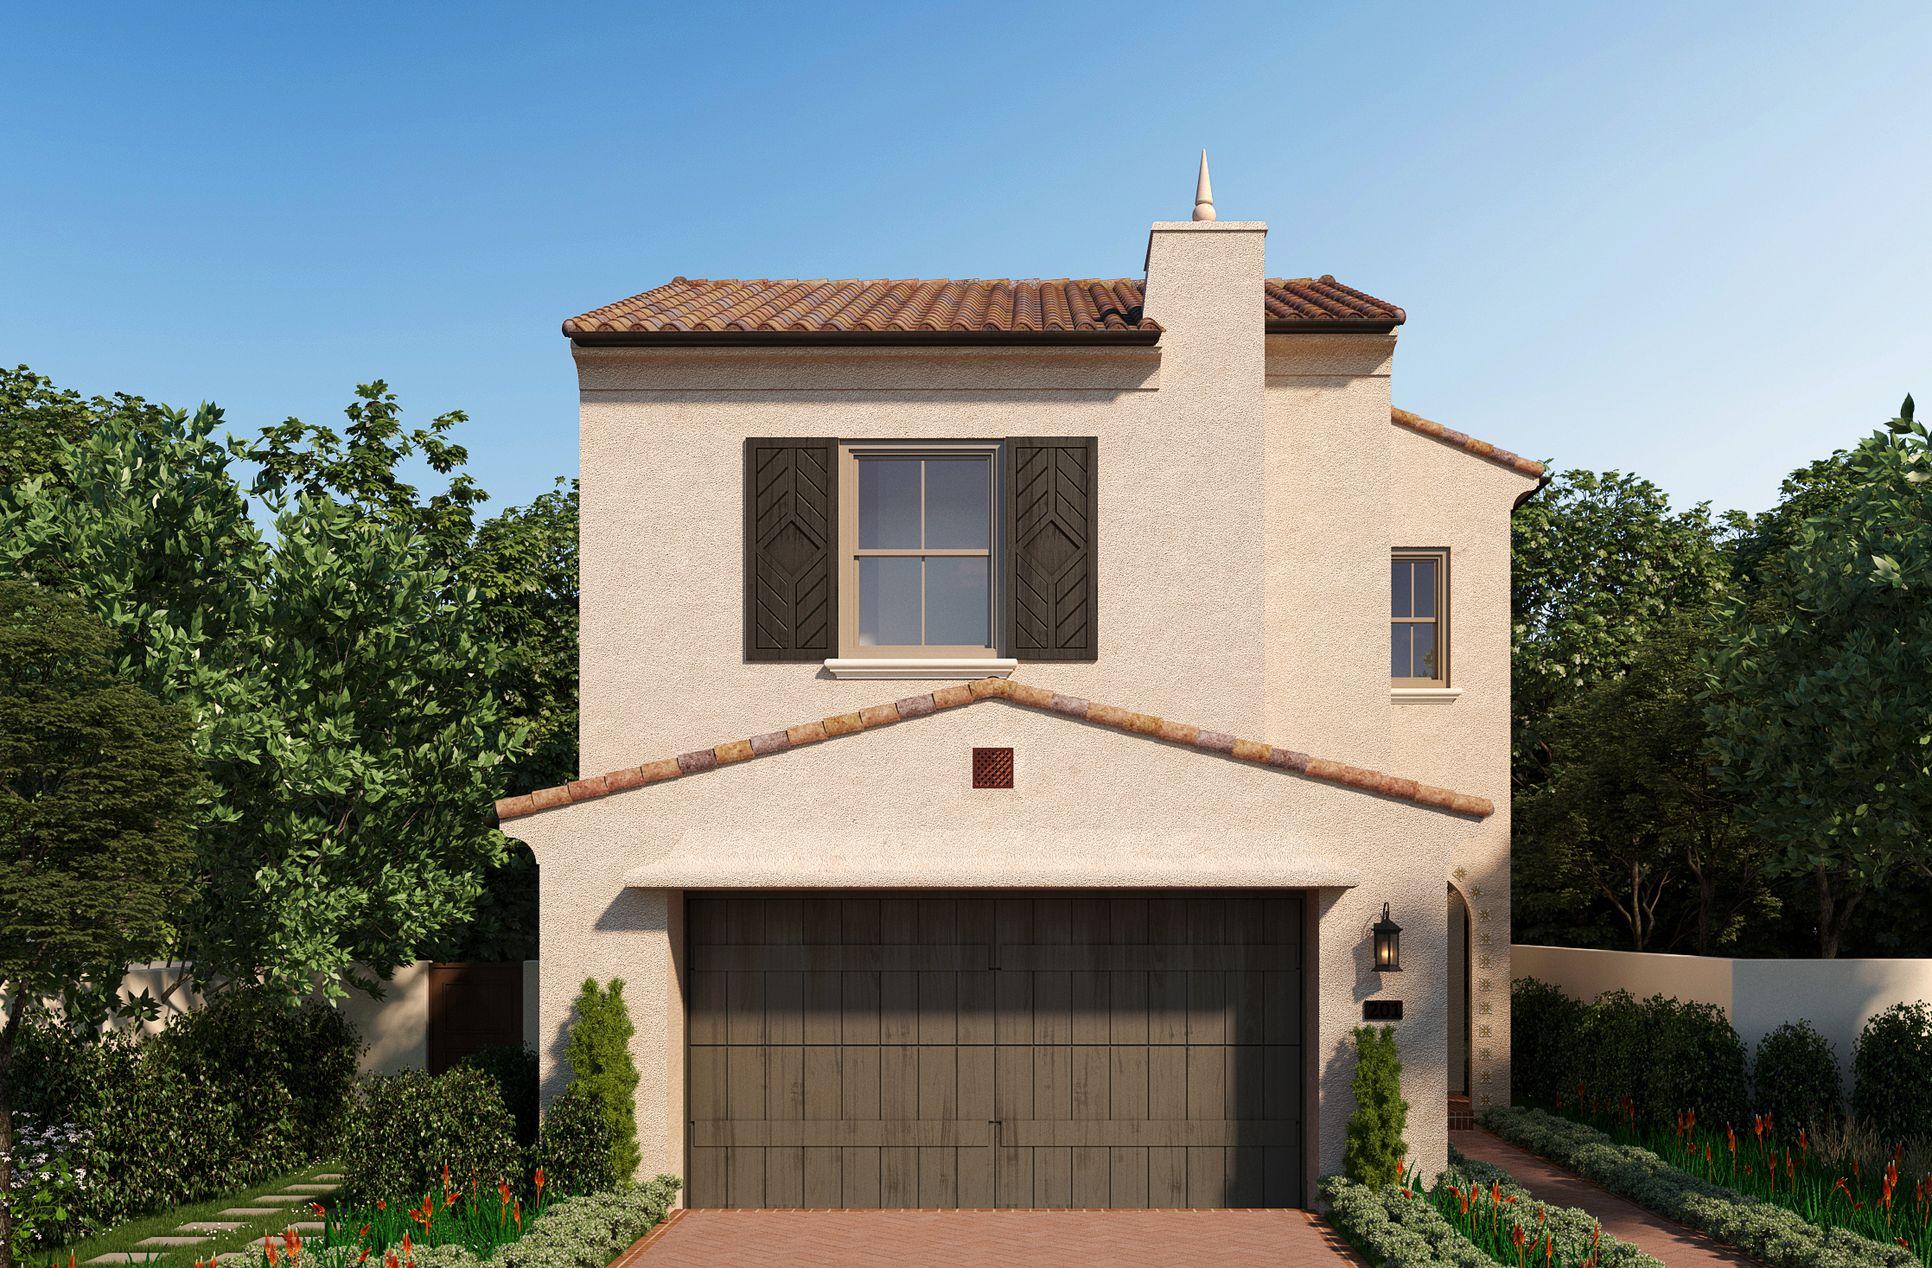 Residence 1 at Highland - Santa Barbara:Residence 1 at Highland - Santa Barbara Style